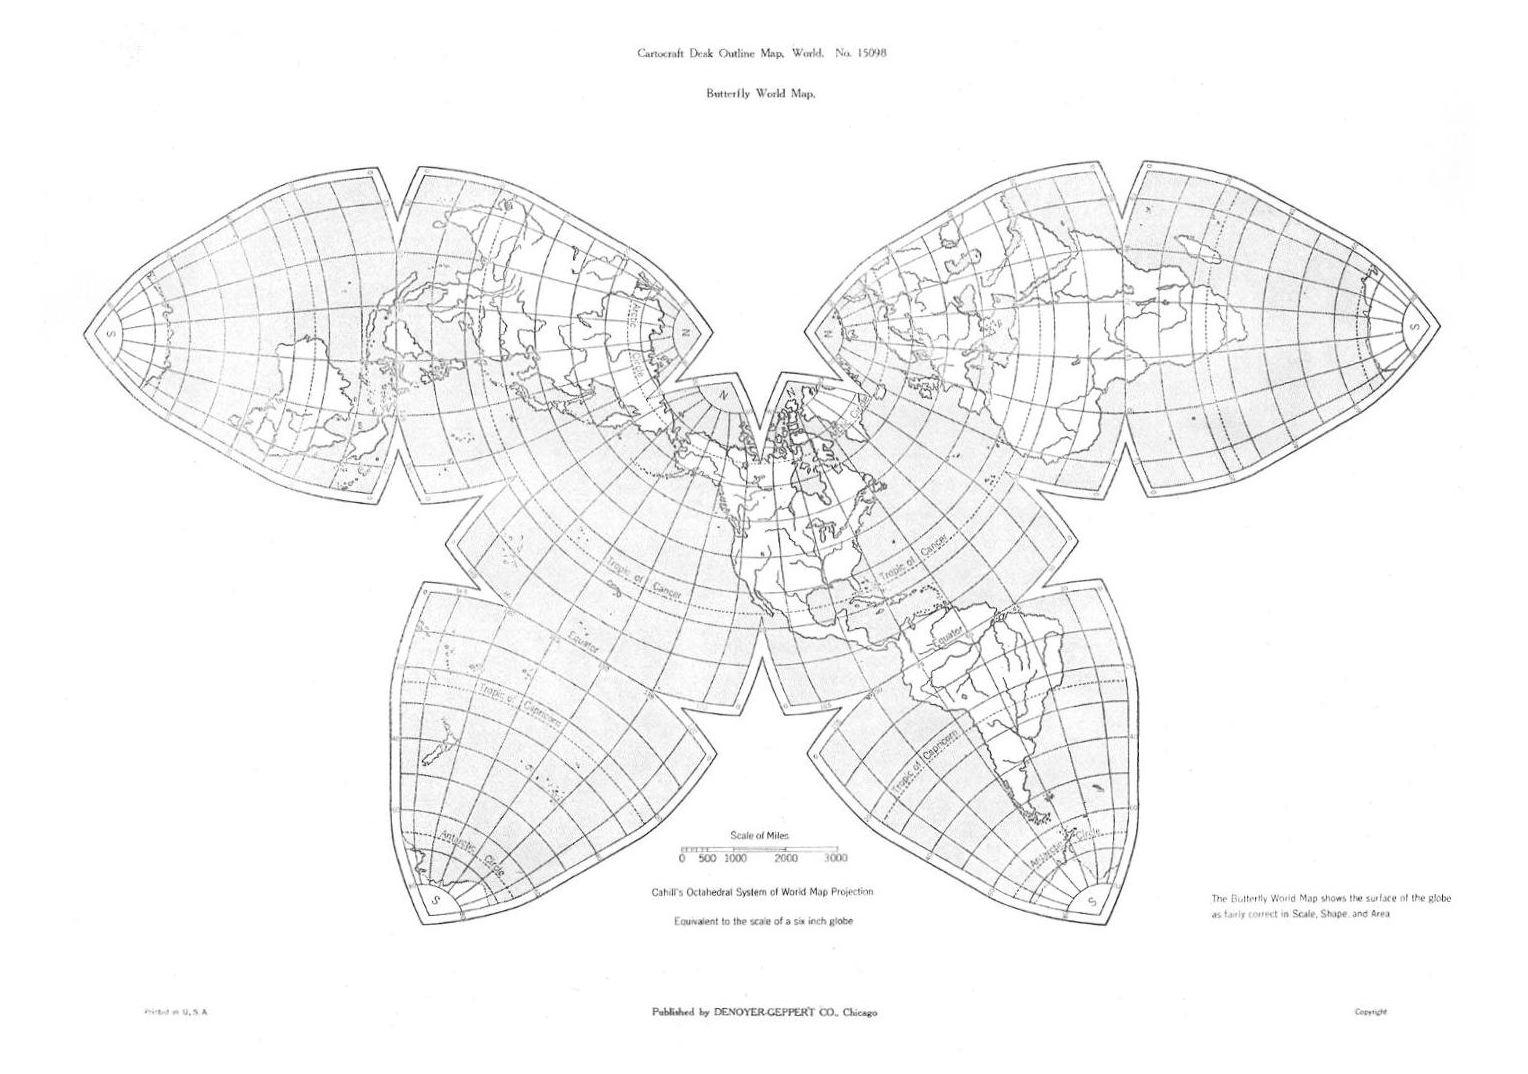 B.J.S.Cahill's Medium-size Desk Maps